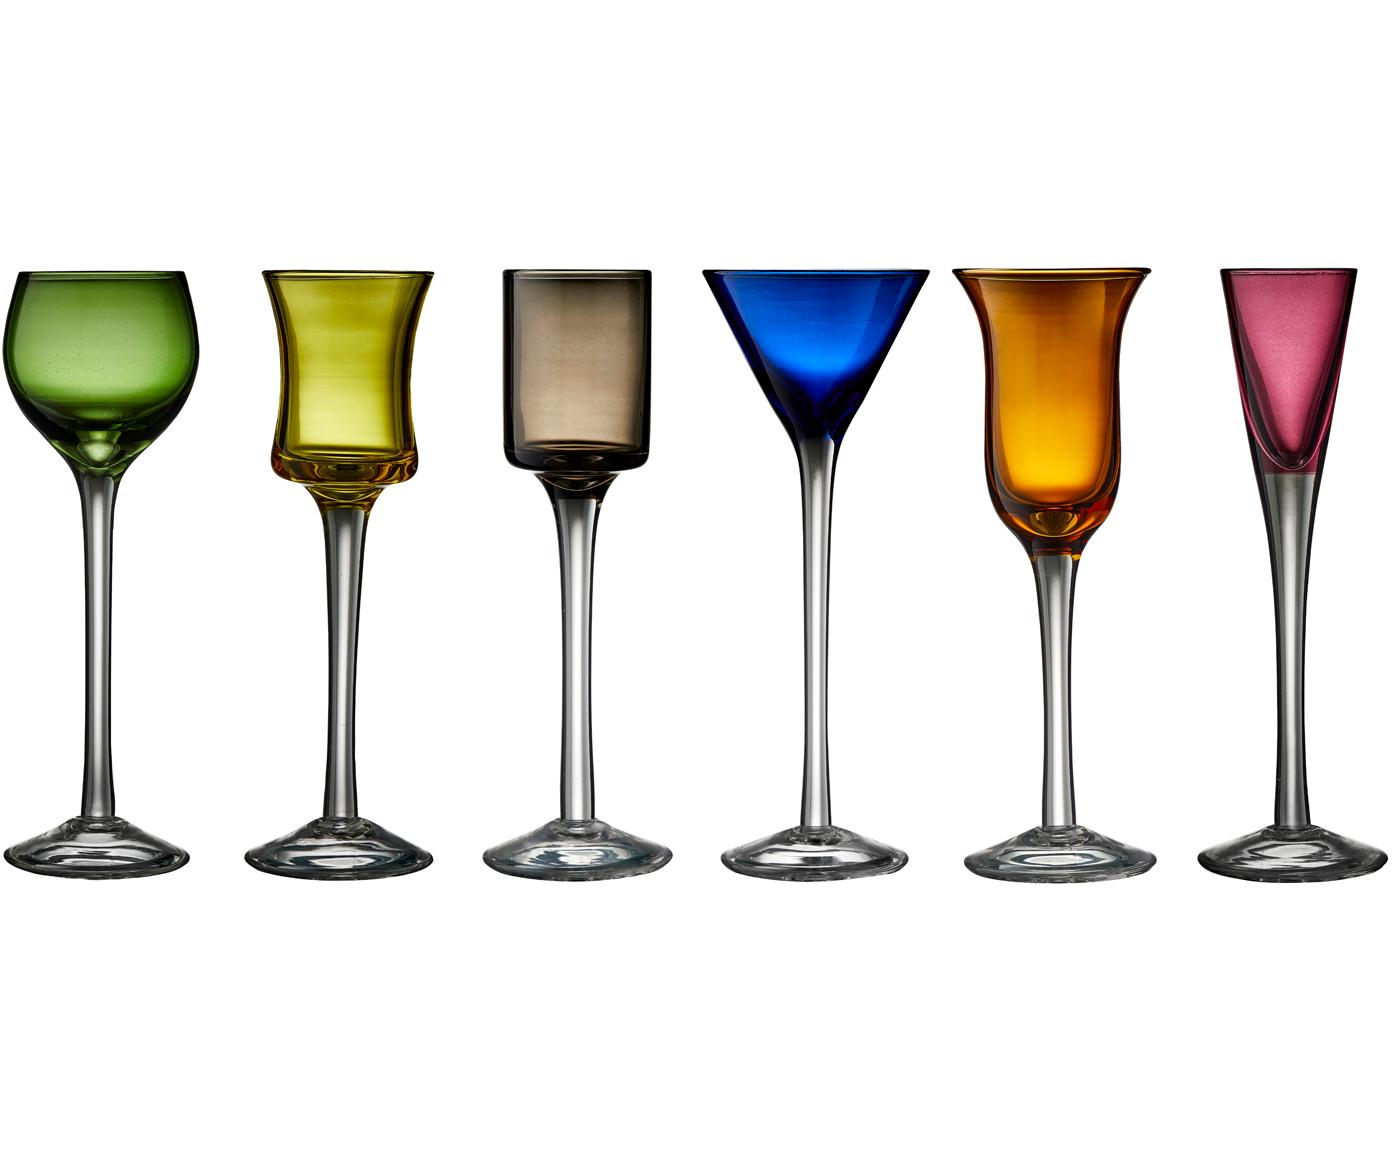 Set de vasos de chupito de vidrio soplado Lyngby, 6pzas., Vidrio, Verde, azul, marrón, amarillo, lila, naranja, Ø 4 x Al 18 cm